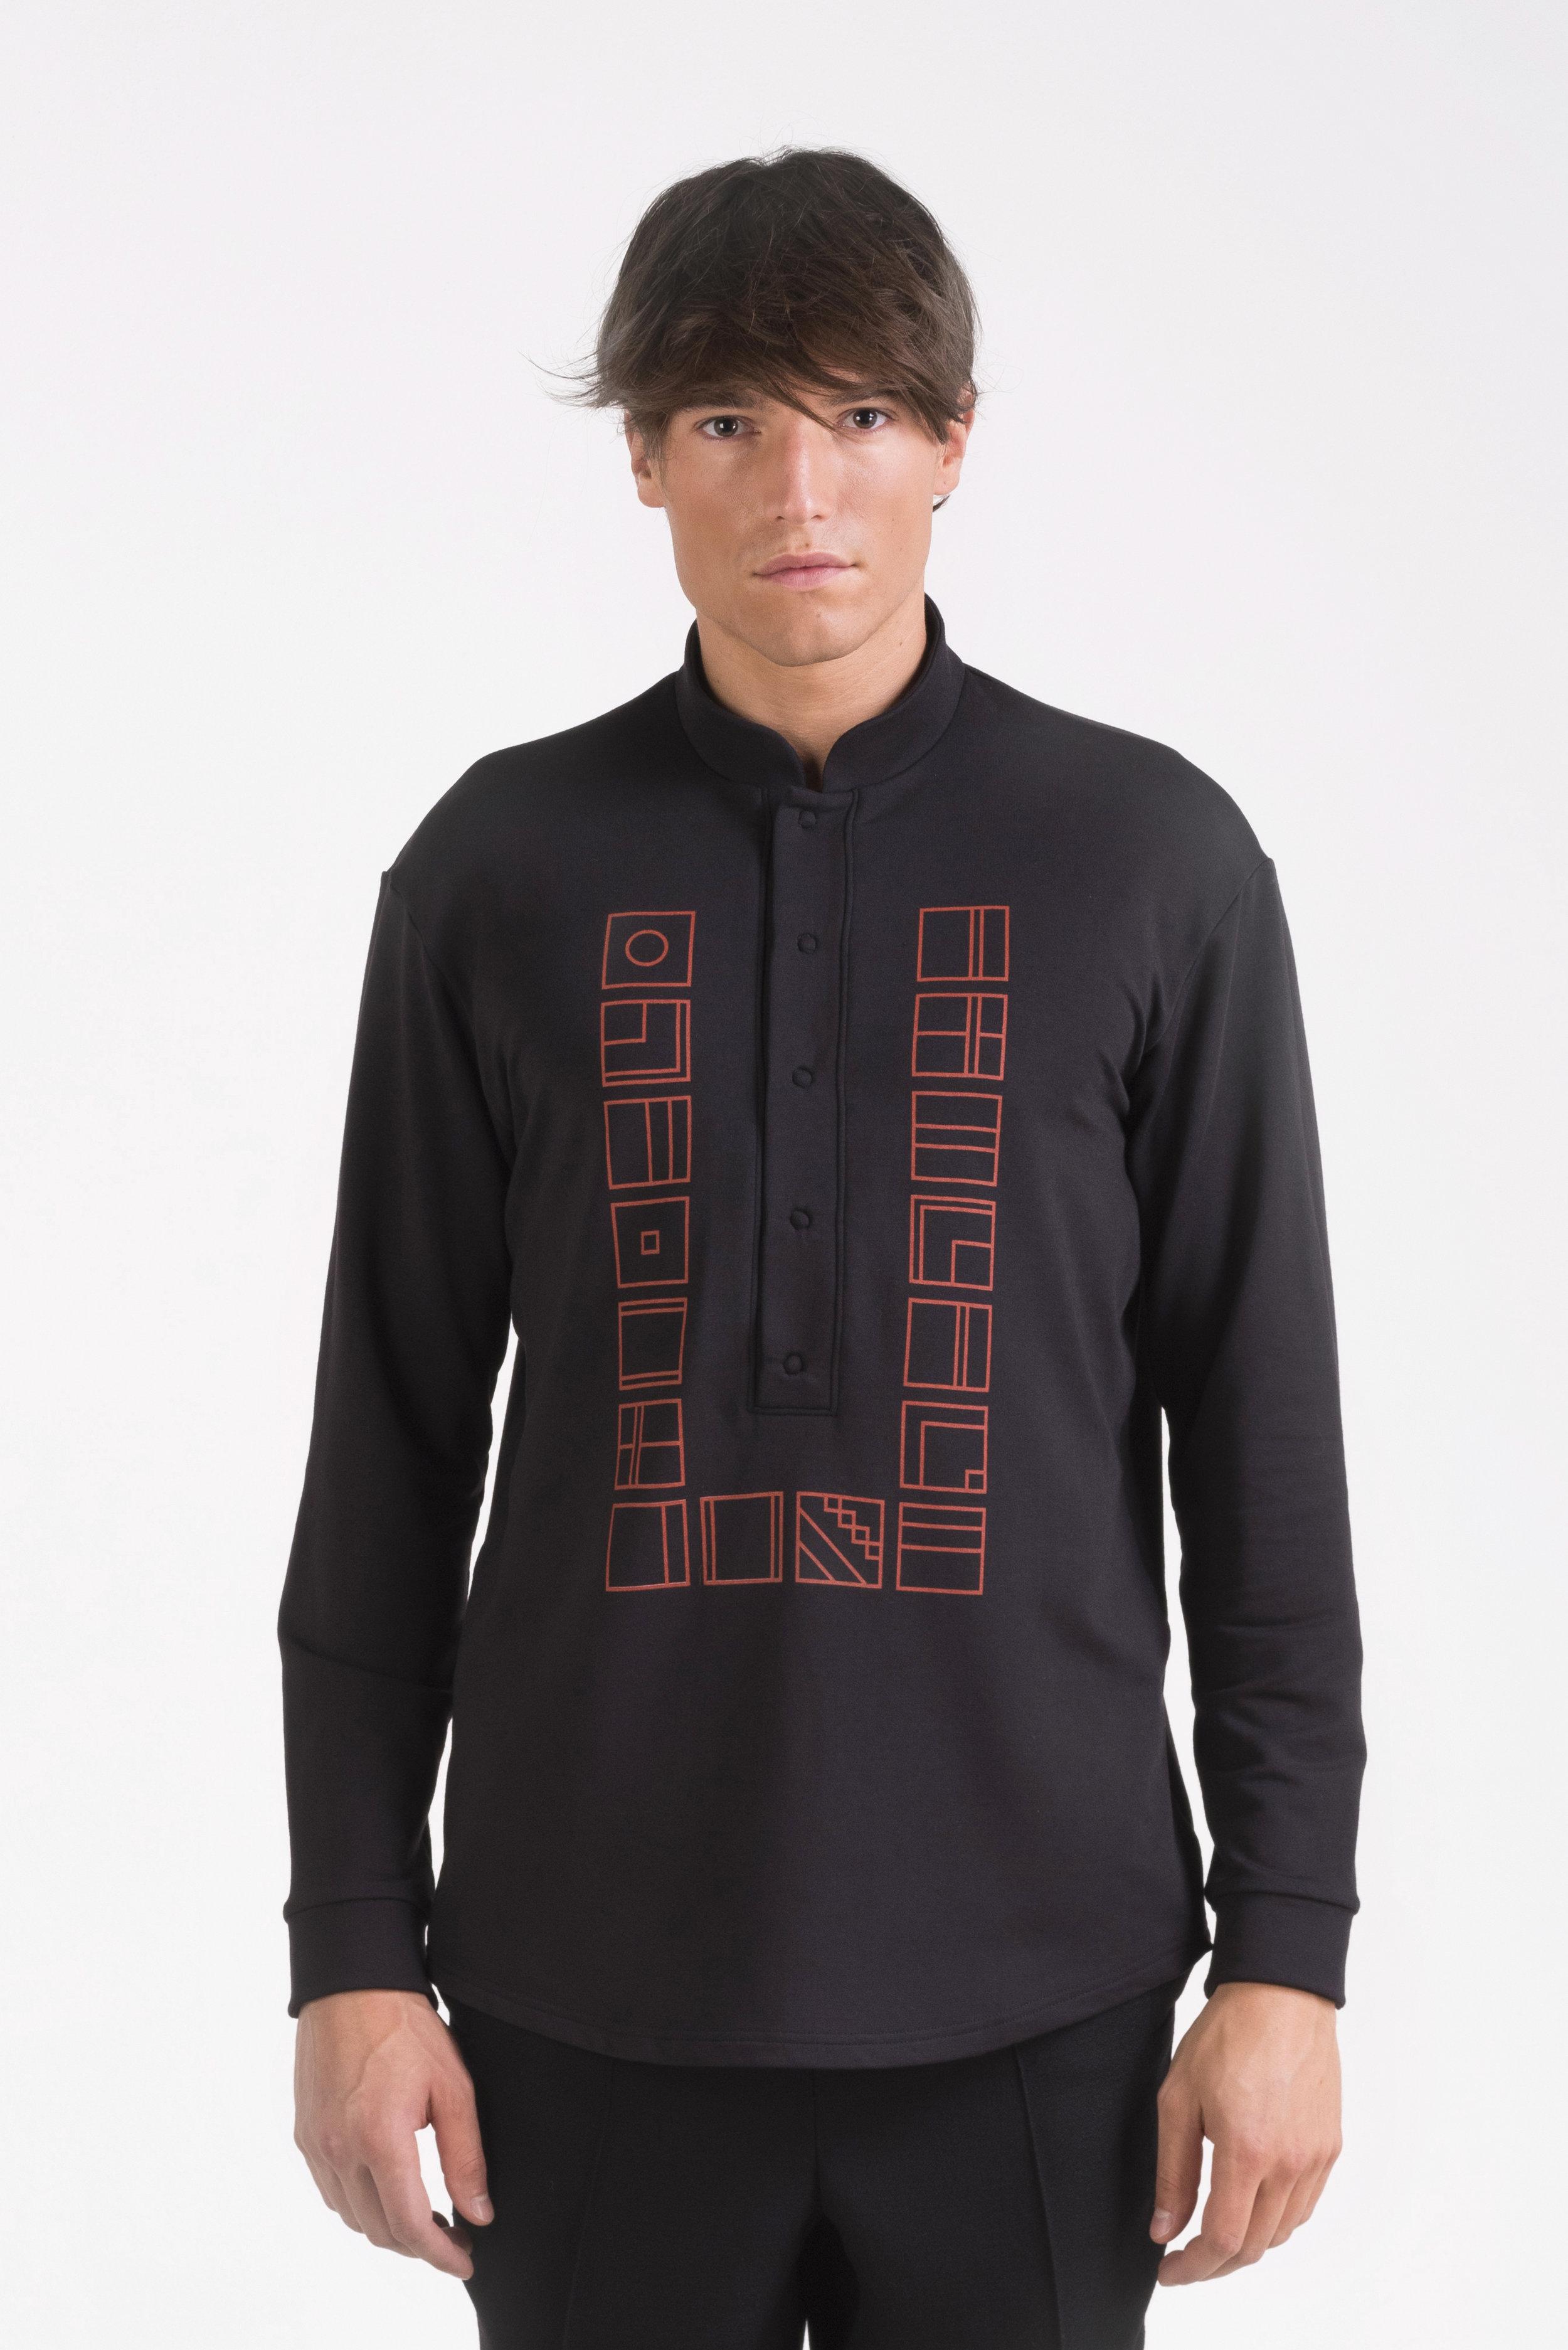 oneculture Barong shirt 2.jpg